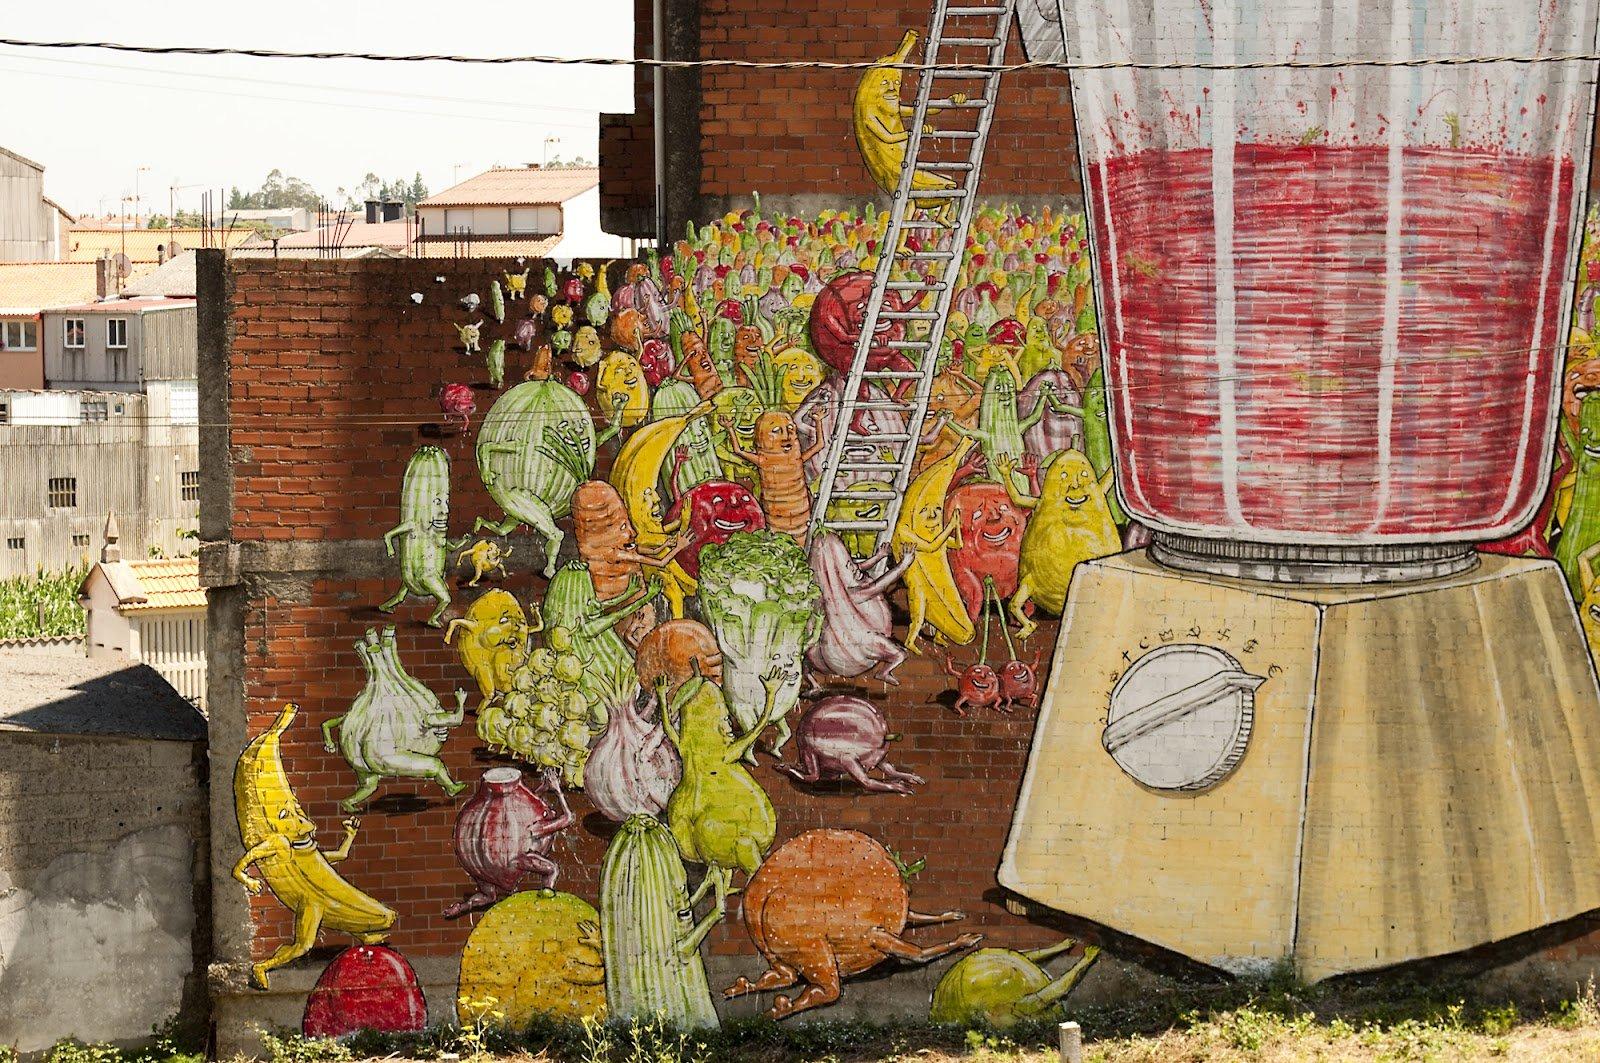 blu-grafite-italia-arte-urbana-donisio-arte (6)